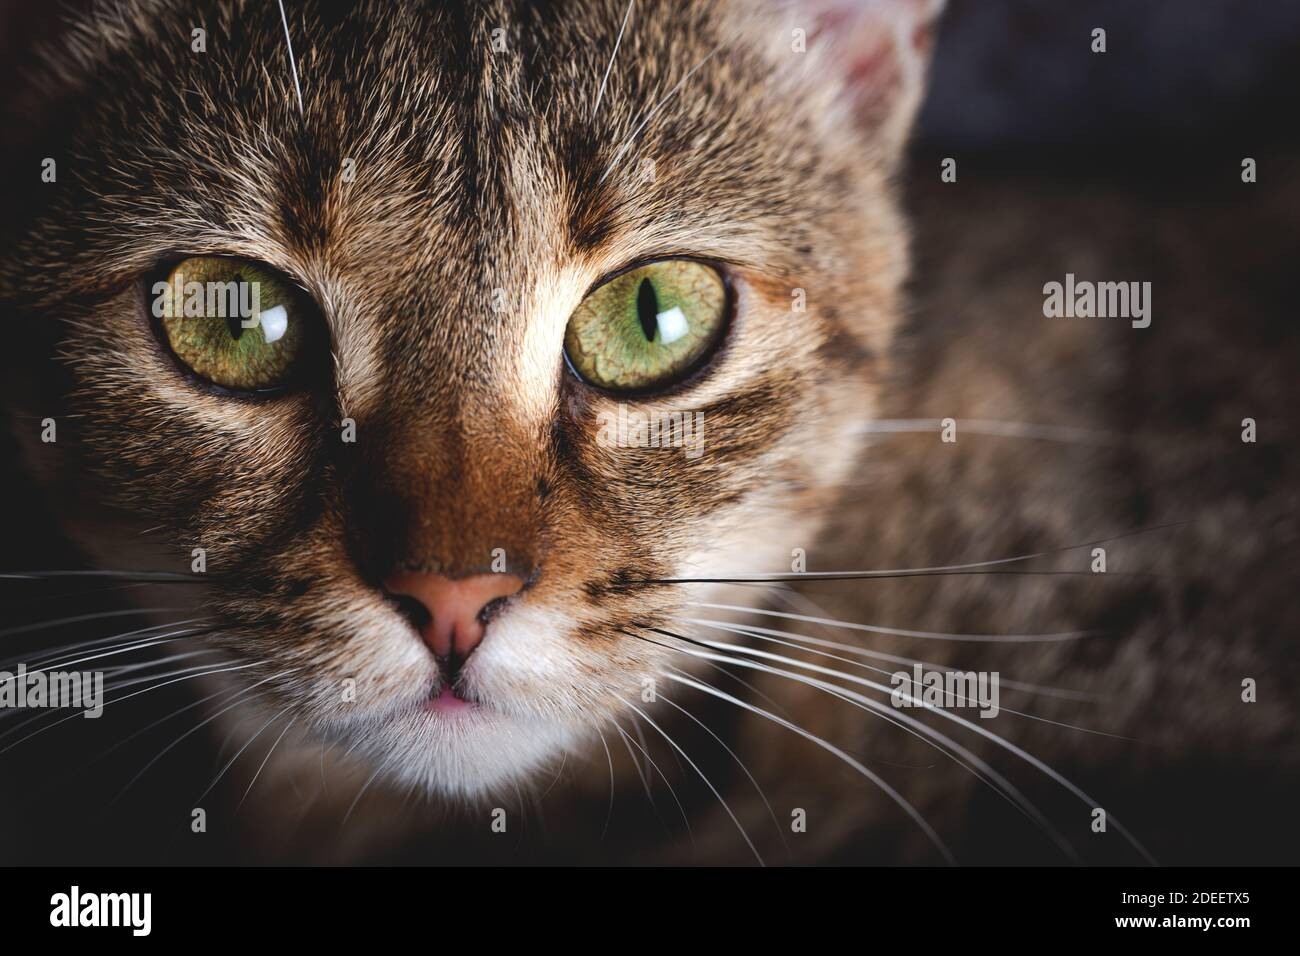 Gatito con ojos hermosos. Primer plano retrato de gatito de ojos verdes. Foto de stock